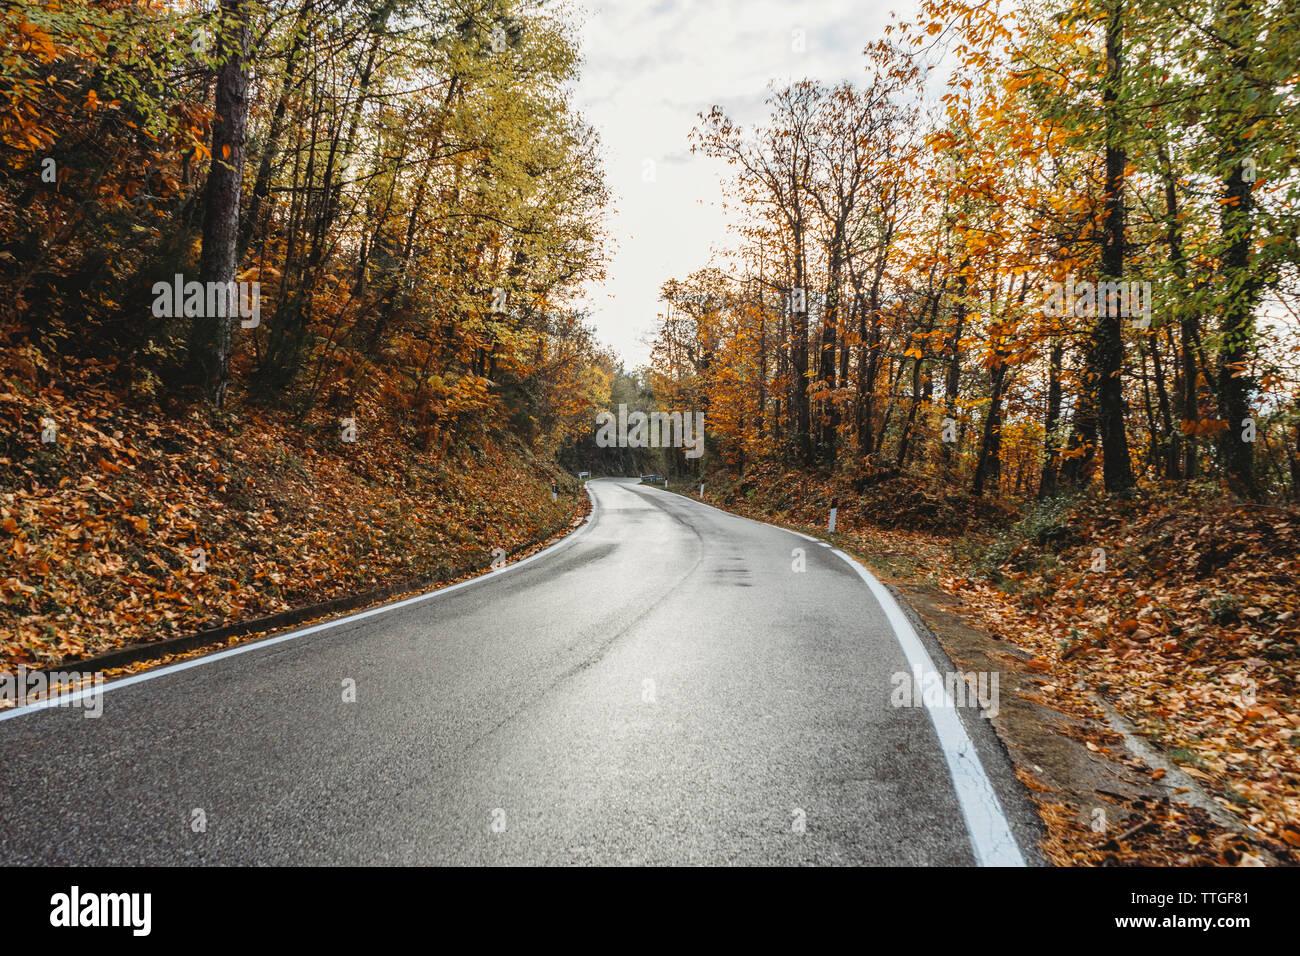 Asphalt road through the yellow forest in Tuscany, autumn season Stock Photo